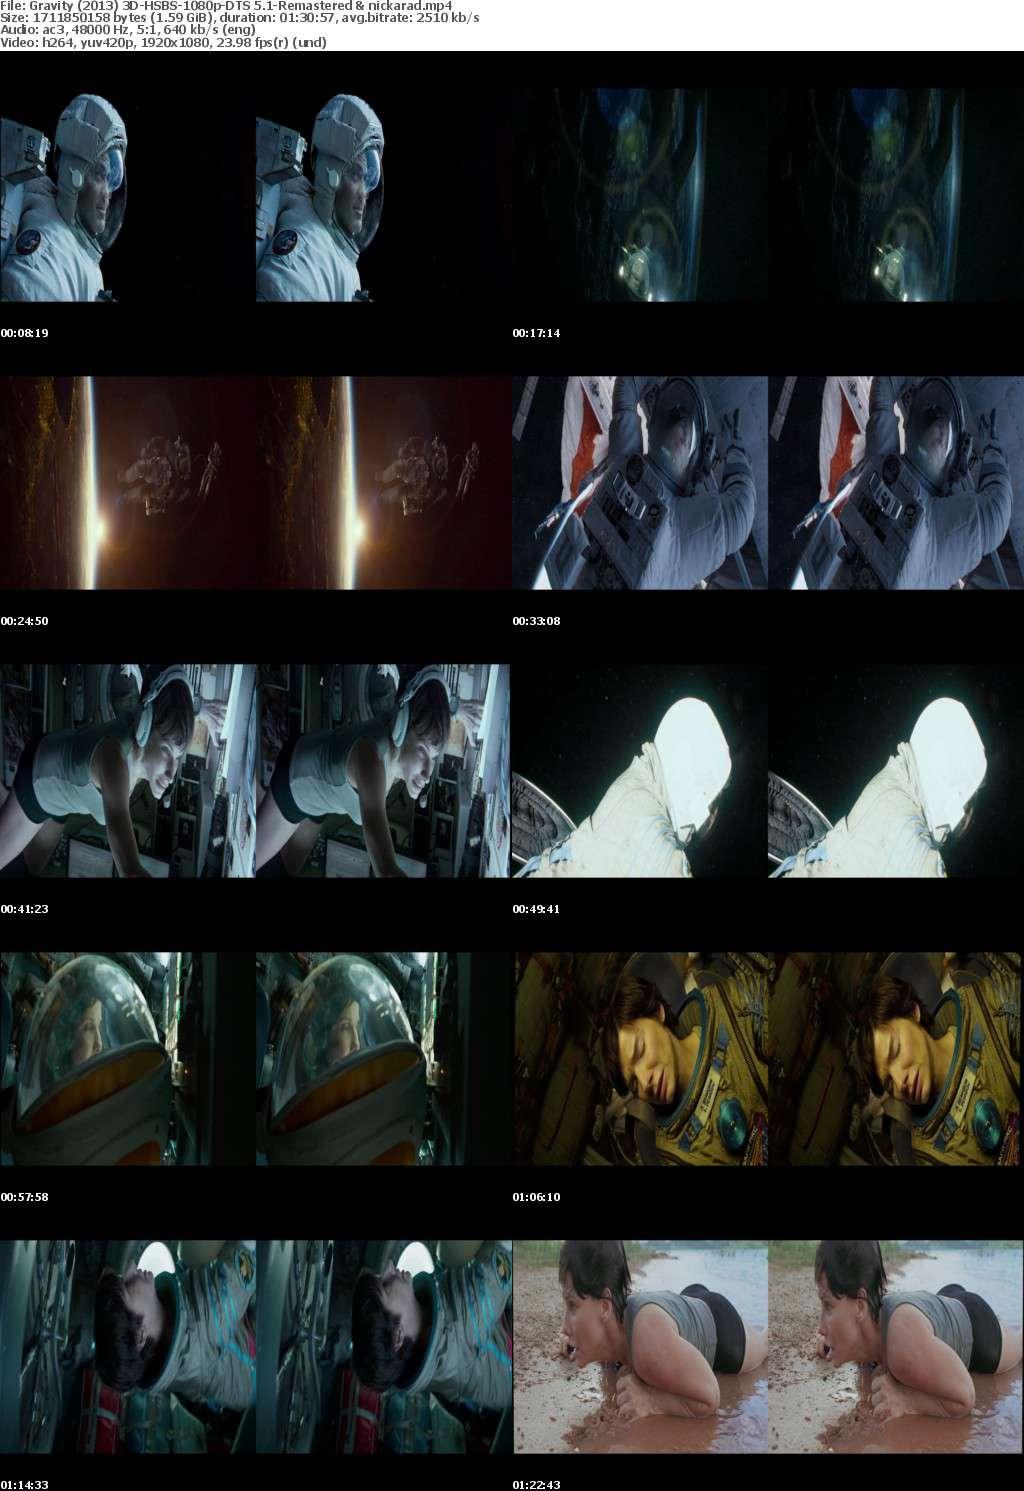 Gravity (2013) 3D HSBS 1080p BluRay AC3 (DTS 5.1)-Remastered-nickarad